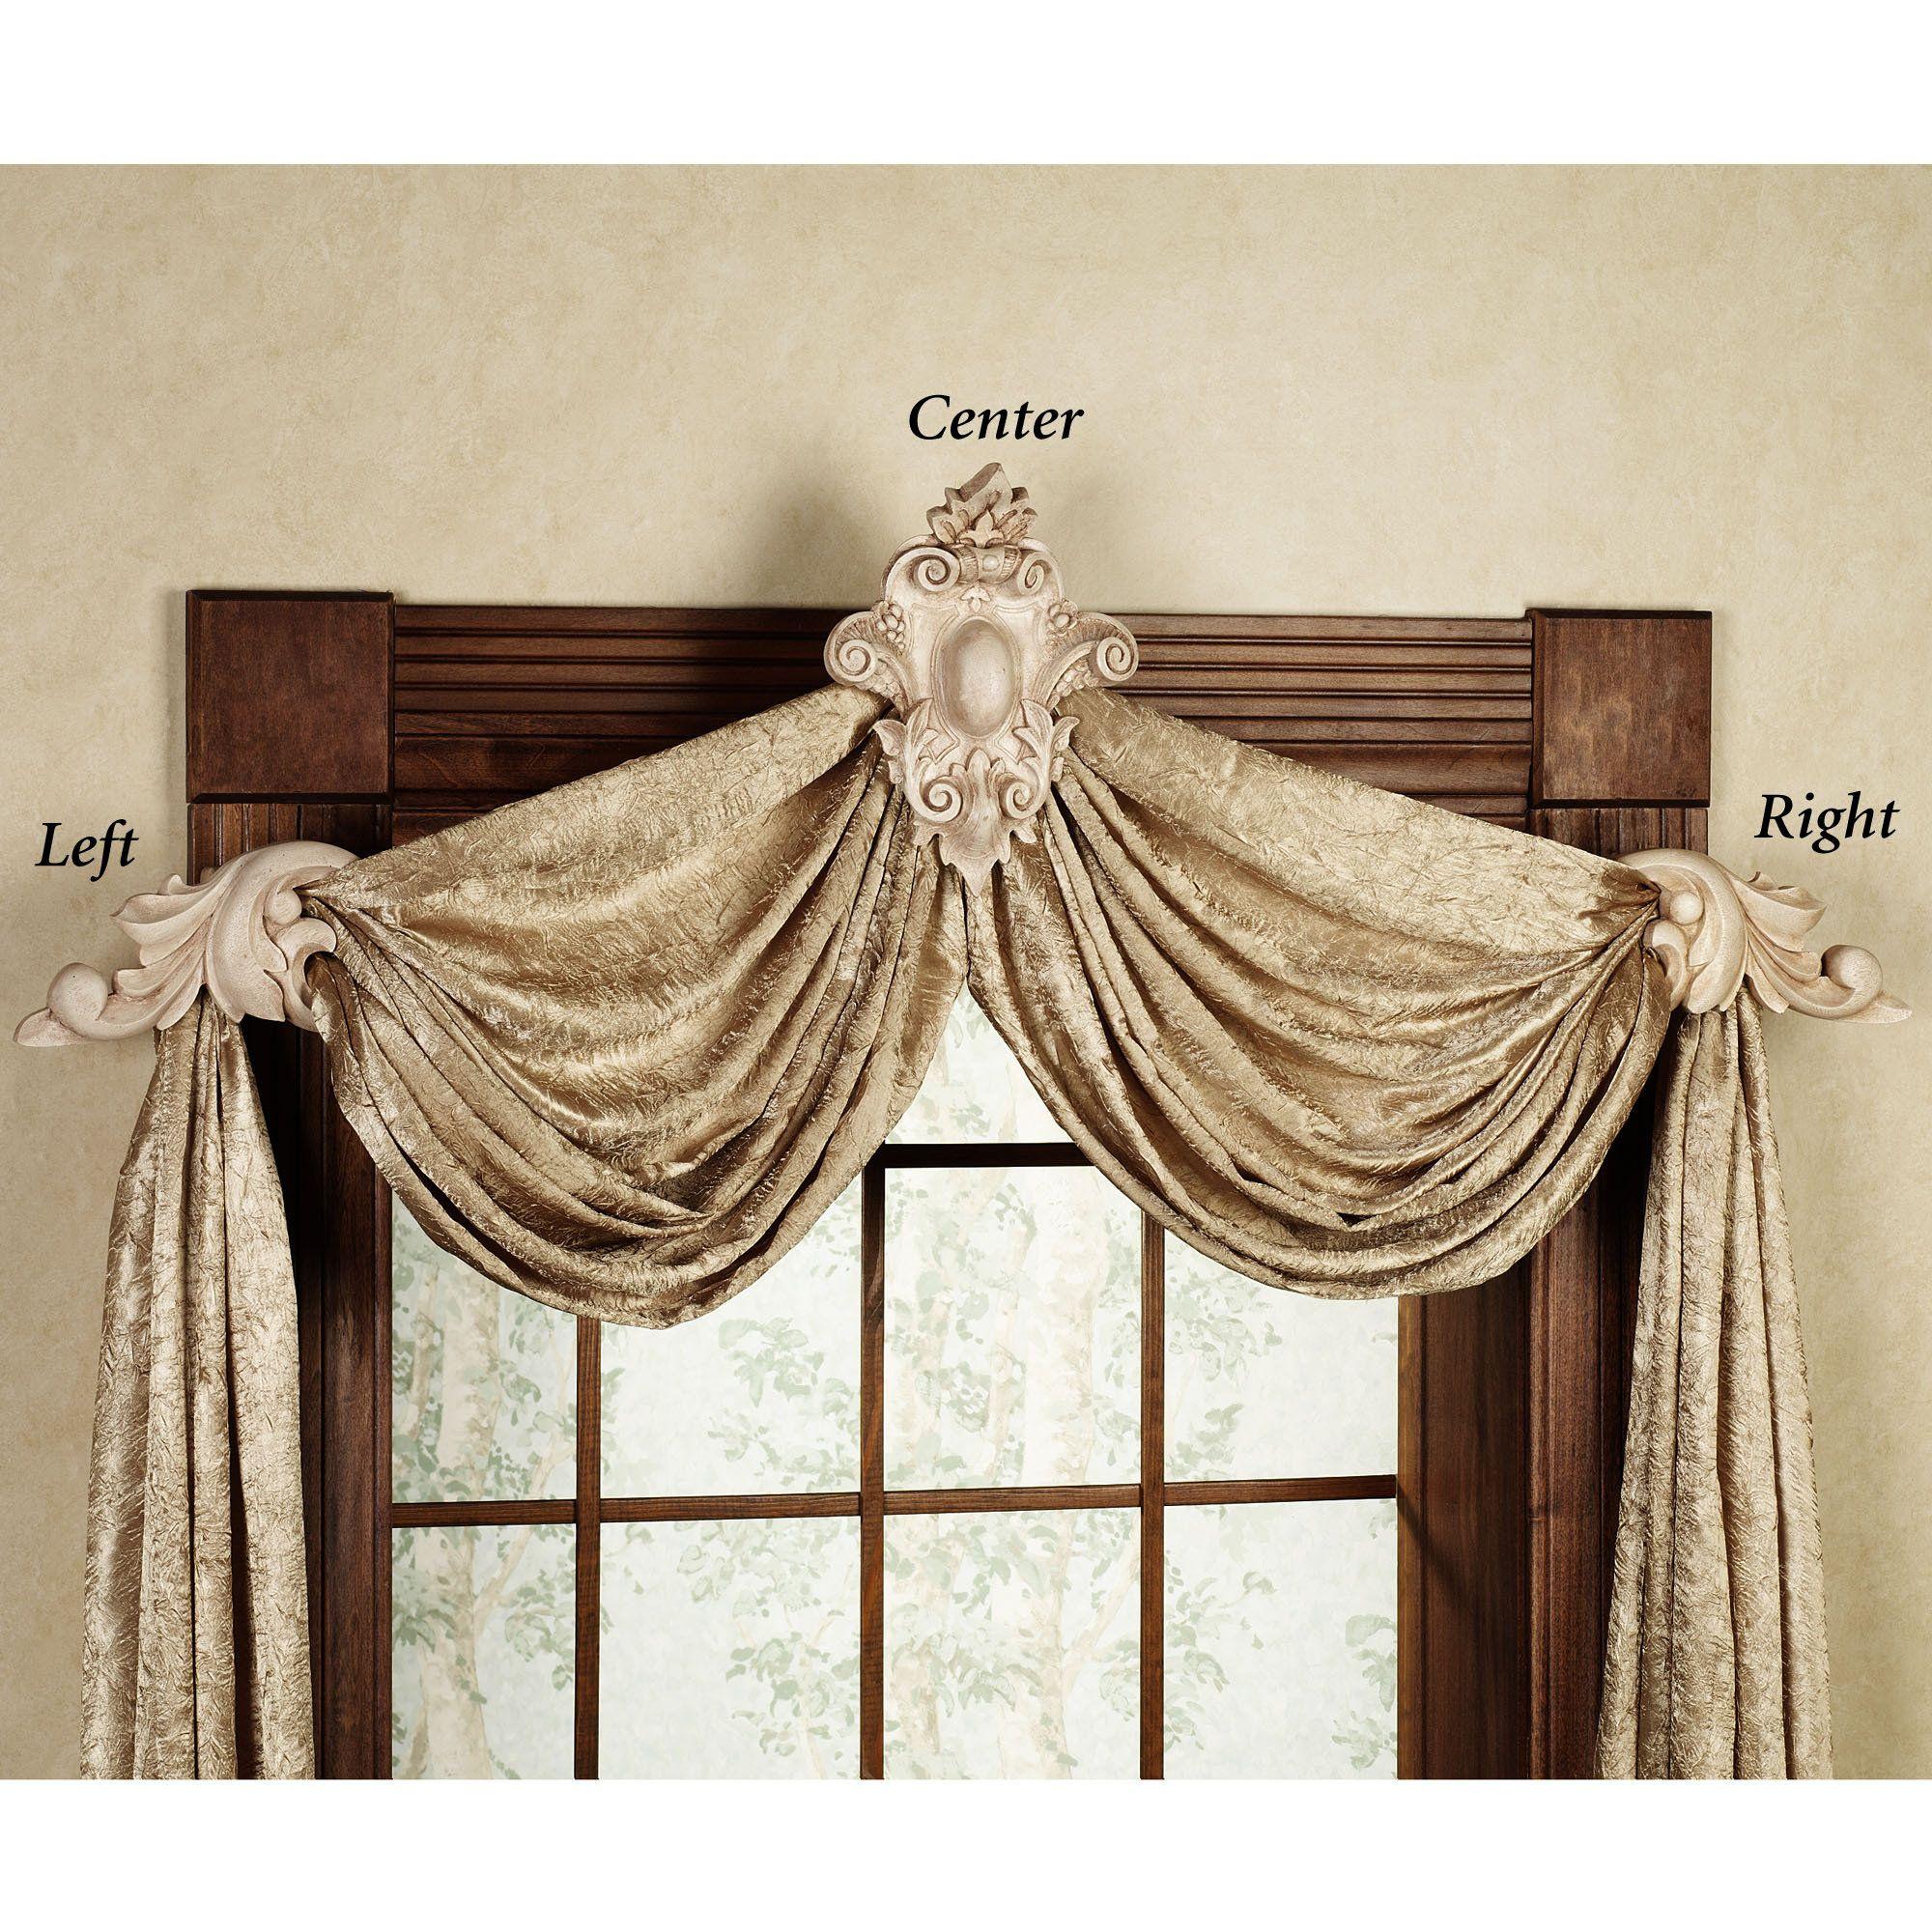 Decorative Window Curtain Sconces | Curtain Menzilperde.Net